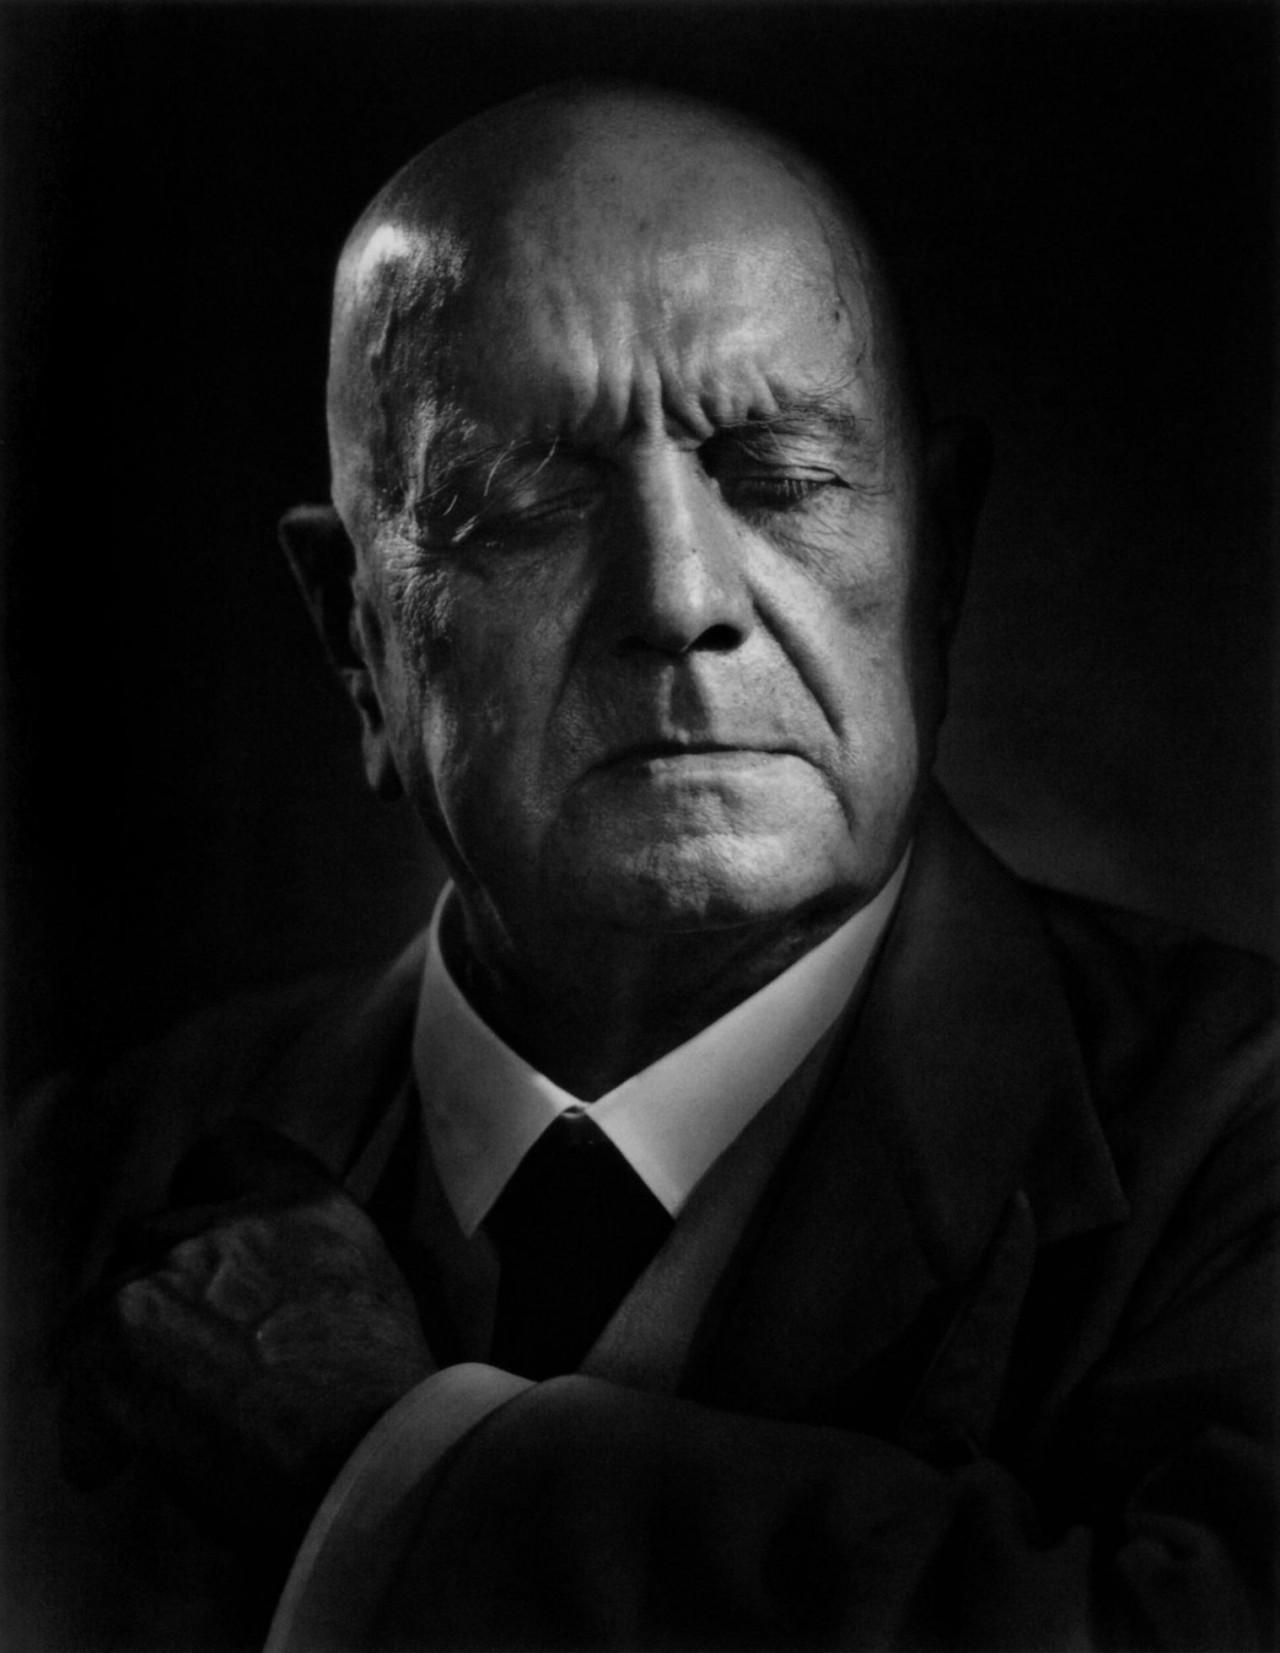 Ян Сибелиус, 1948. Автор Юсуф Карш